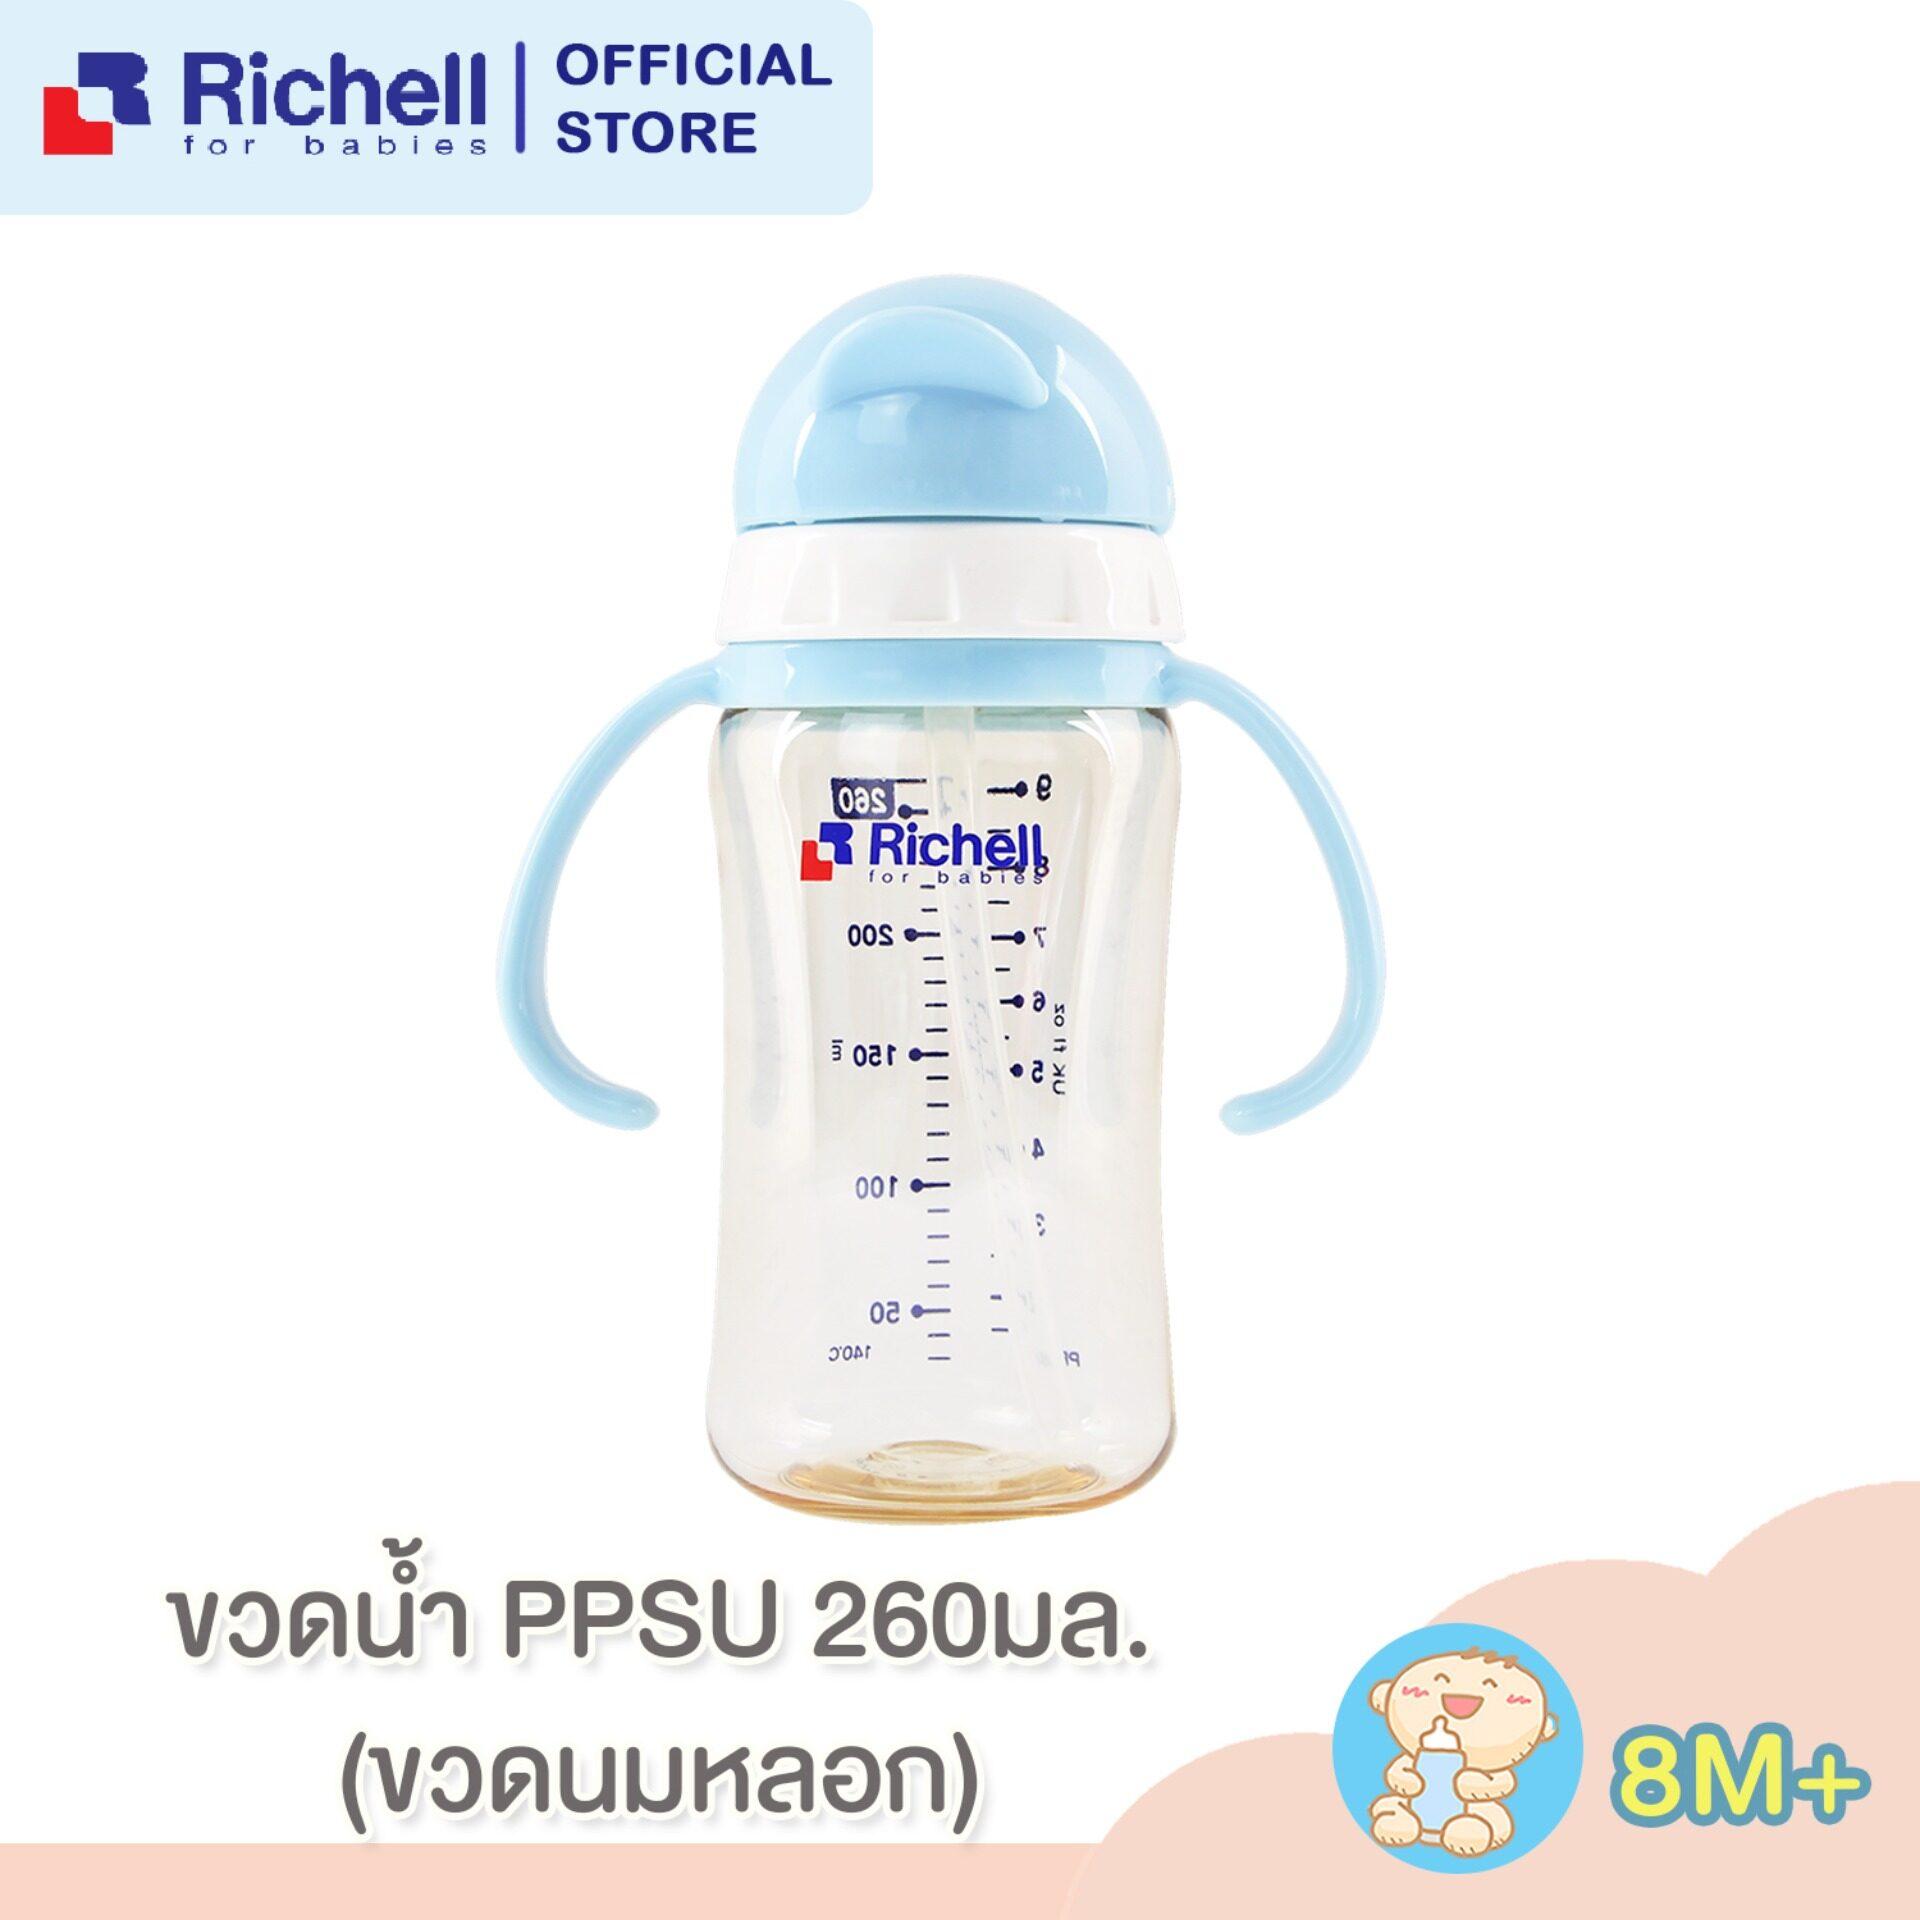 Richell (ริเชล) ขวดน้ำ ขวดนมหลอก ขนาด 260 ml. ระบบสุญญากาศป้องกันการหก ทำมาจาก PP